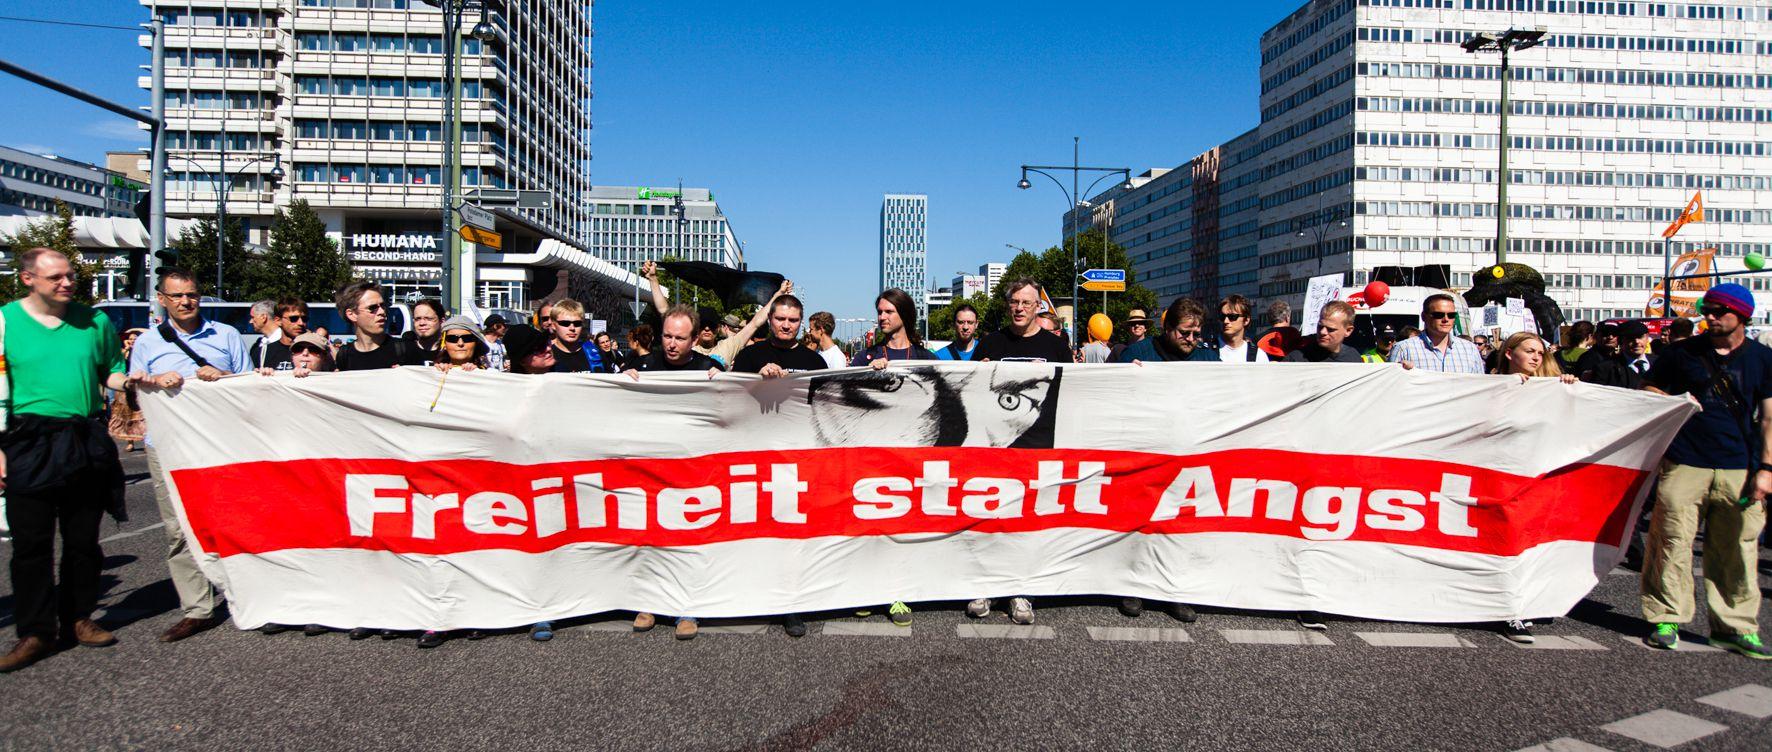 Freiheit statt Angst 2014 in Berlin